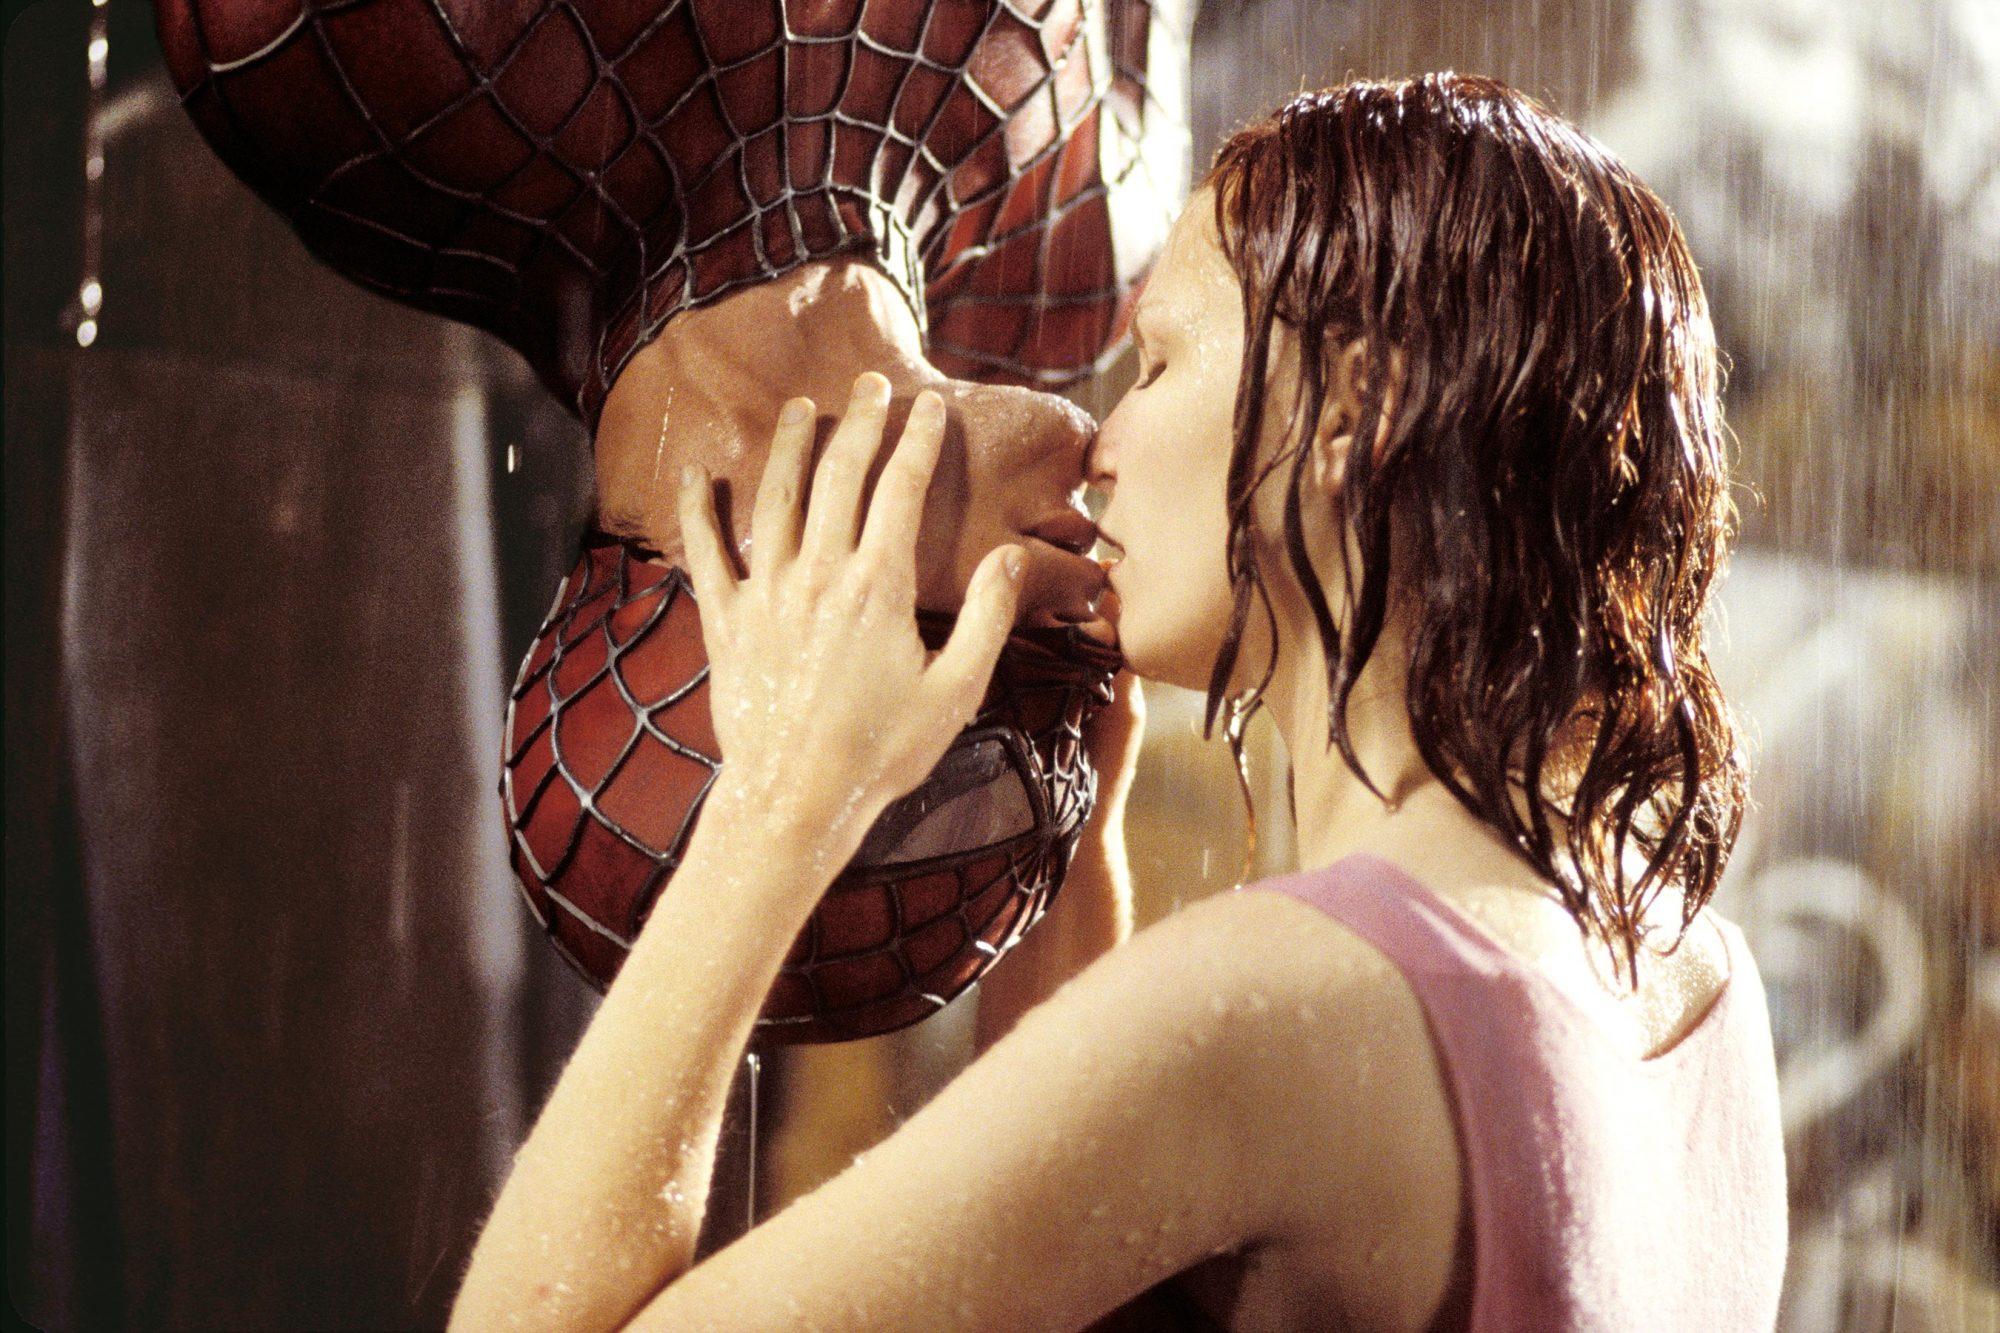 Spider-Man (2002)Tobey Maguire and Kirsten Dunst